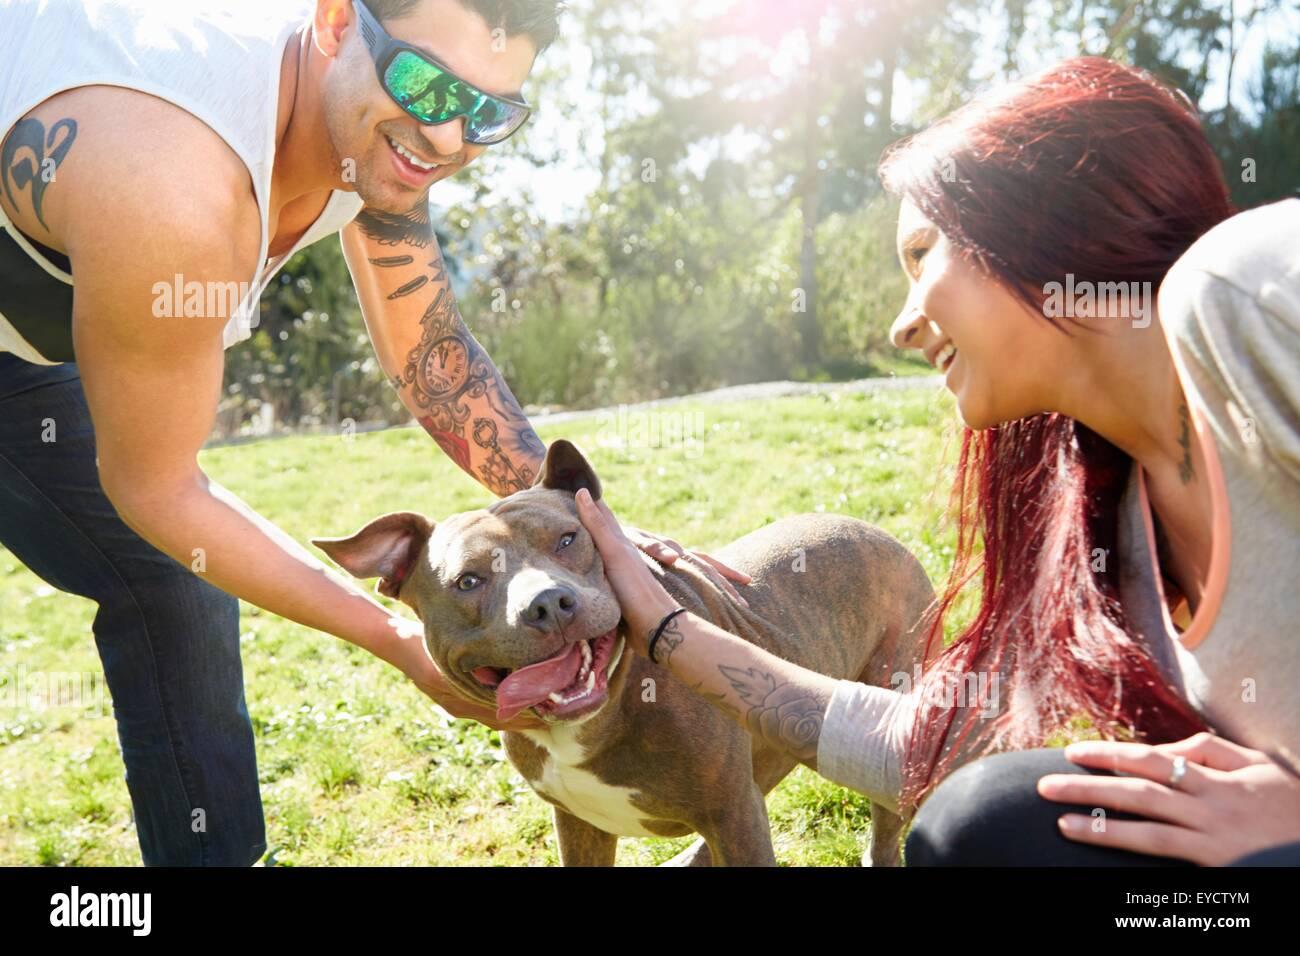 Jeune couple petting dog in park Photo Stock